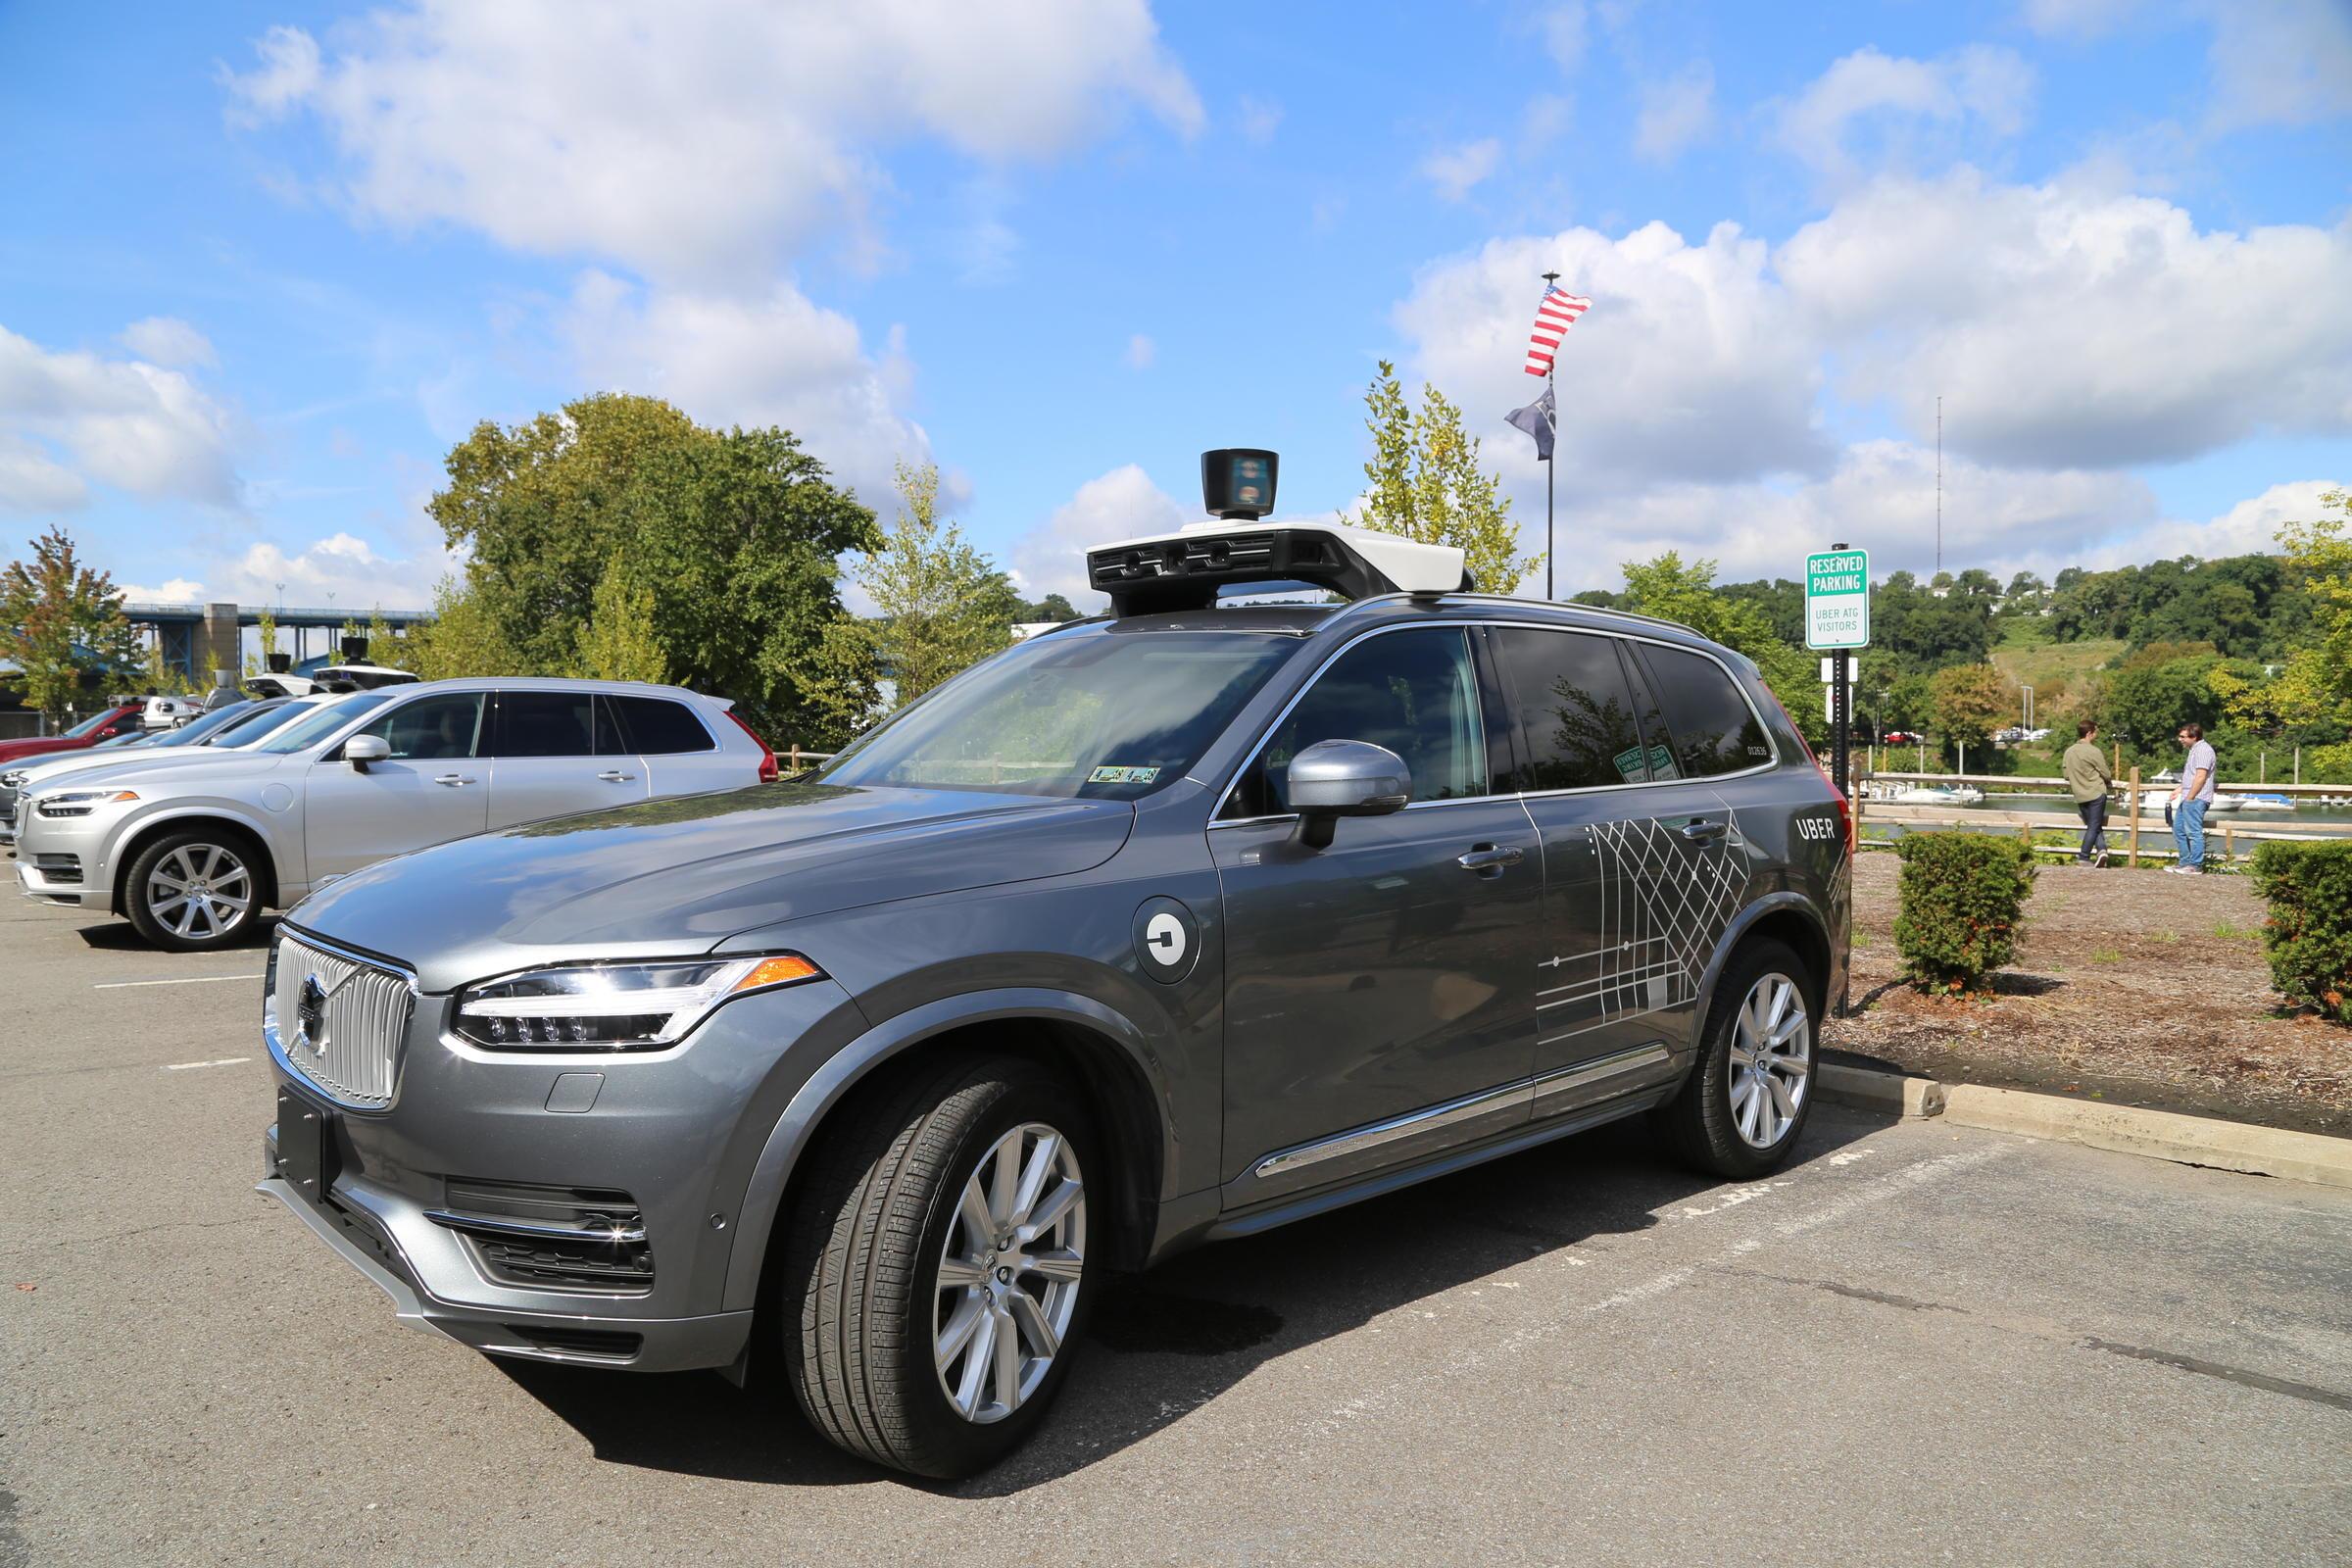 Uber to resume Autonomous Vehicle Testing Program